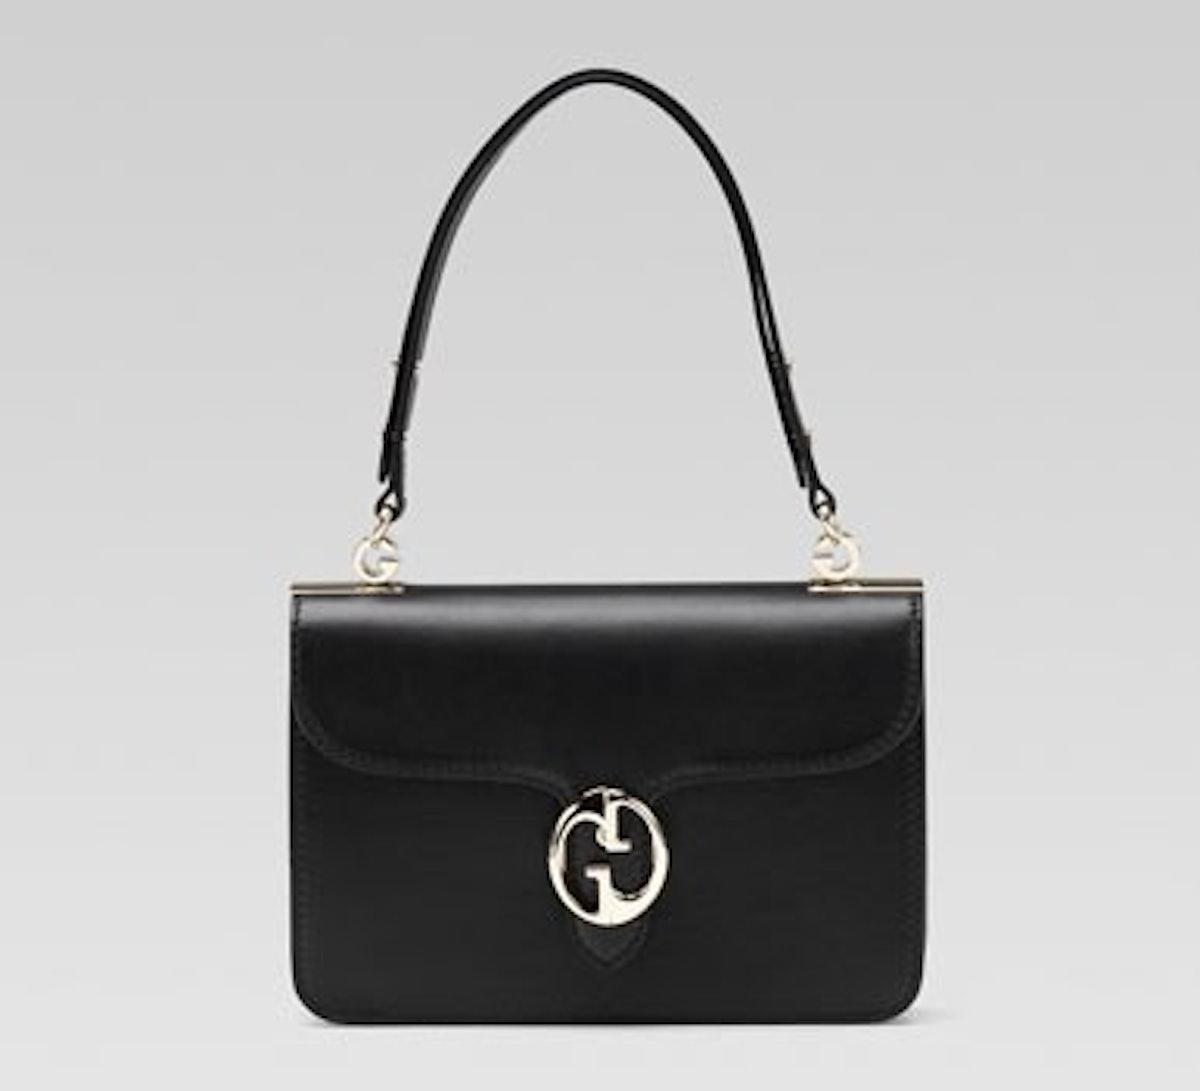 article_Gucci-Bag-%242100.00.jpg